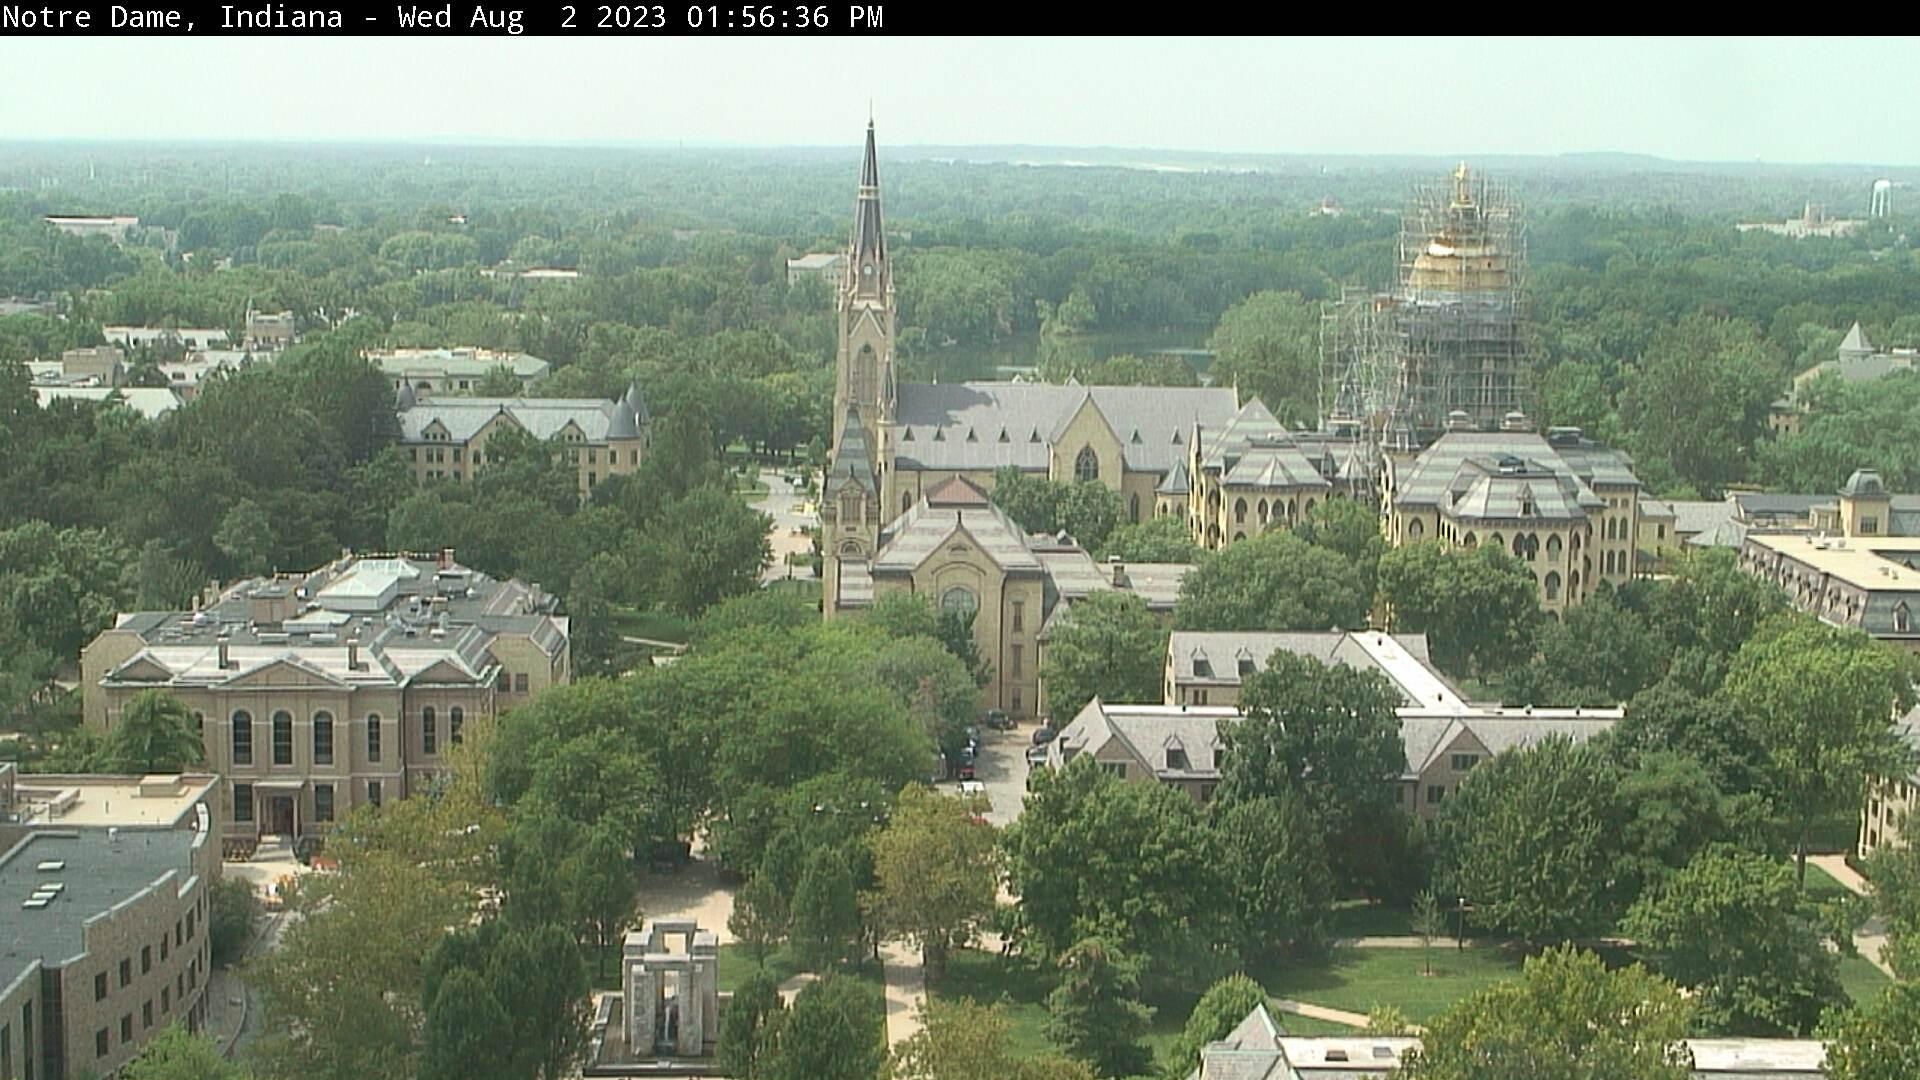 Notre Dame, Indiana Sat. 13:56